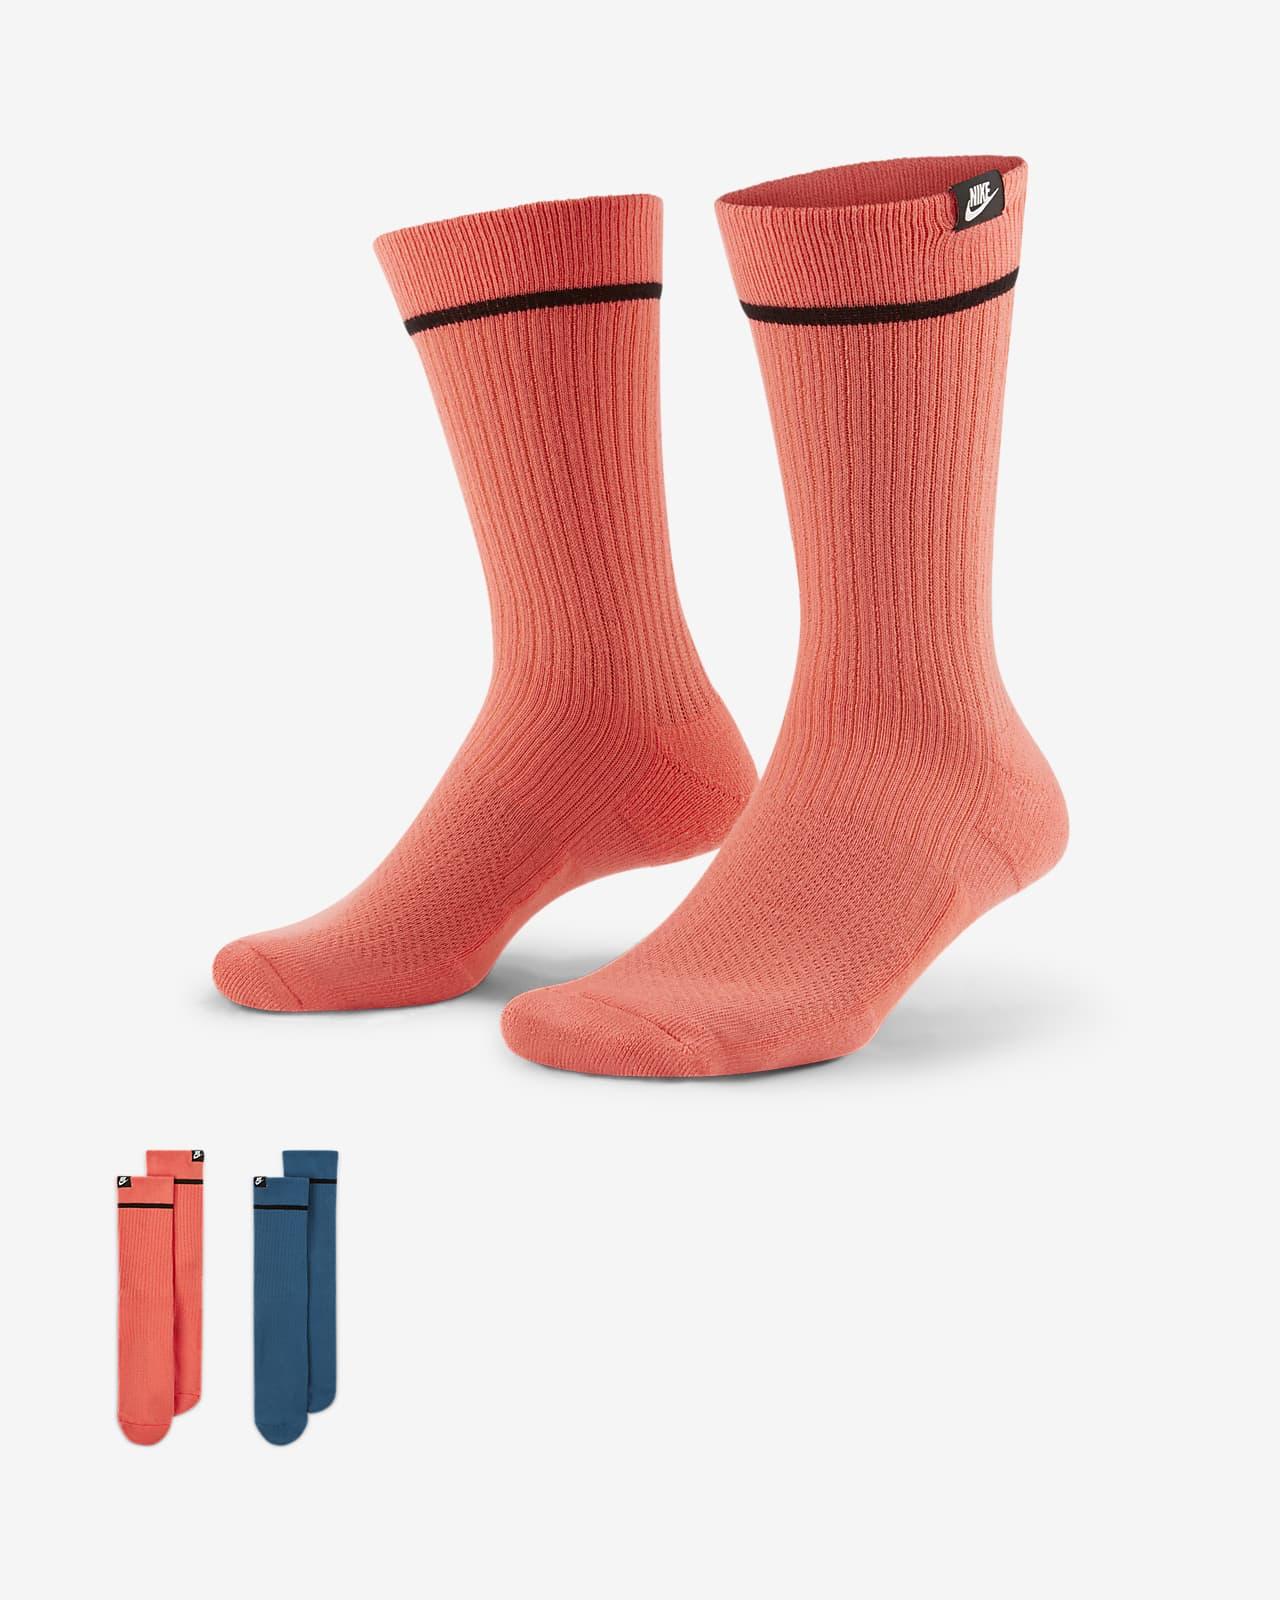 Nike SNKR Sox Unisex Crew Socks (2 Pairs)